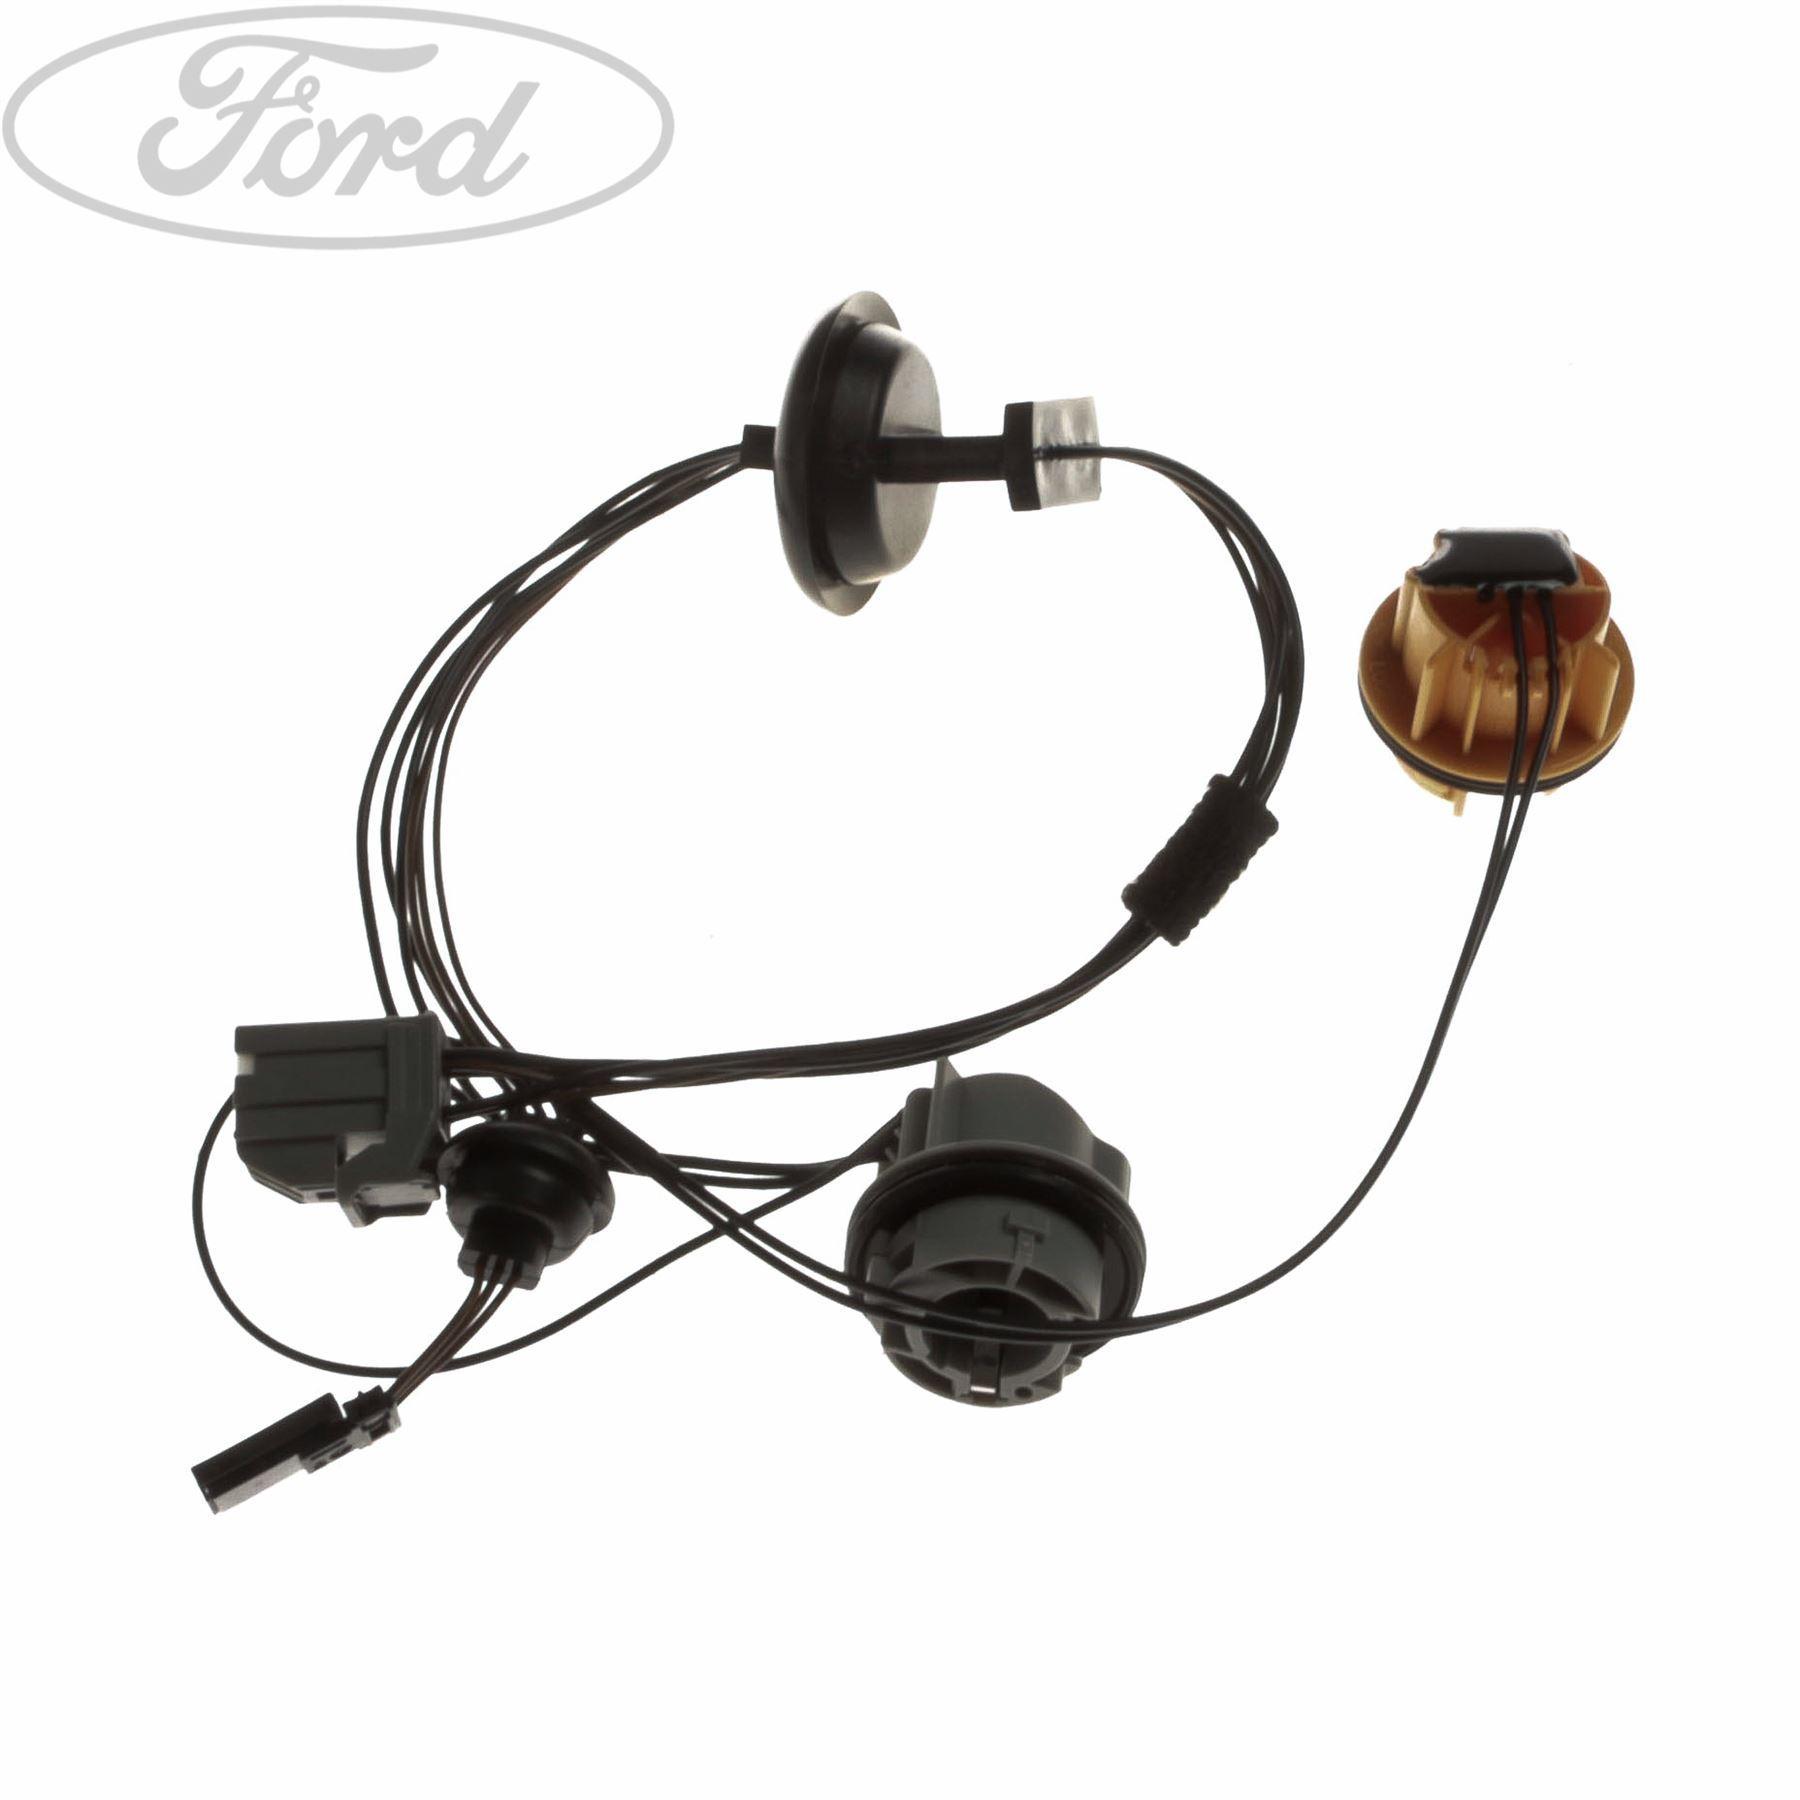 Genuine Ford Focus Mk2 Rear Light Lamp Wiring 1520746